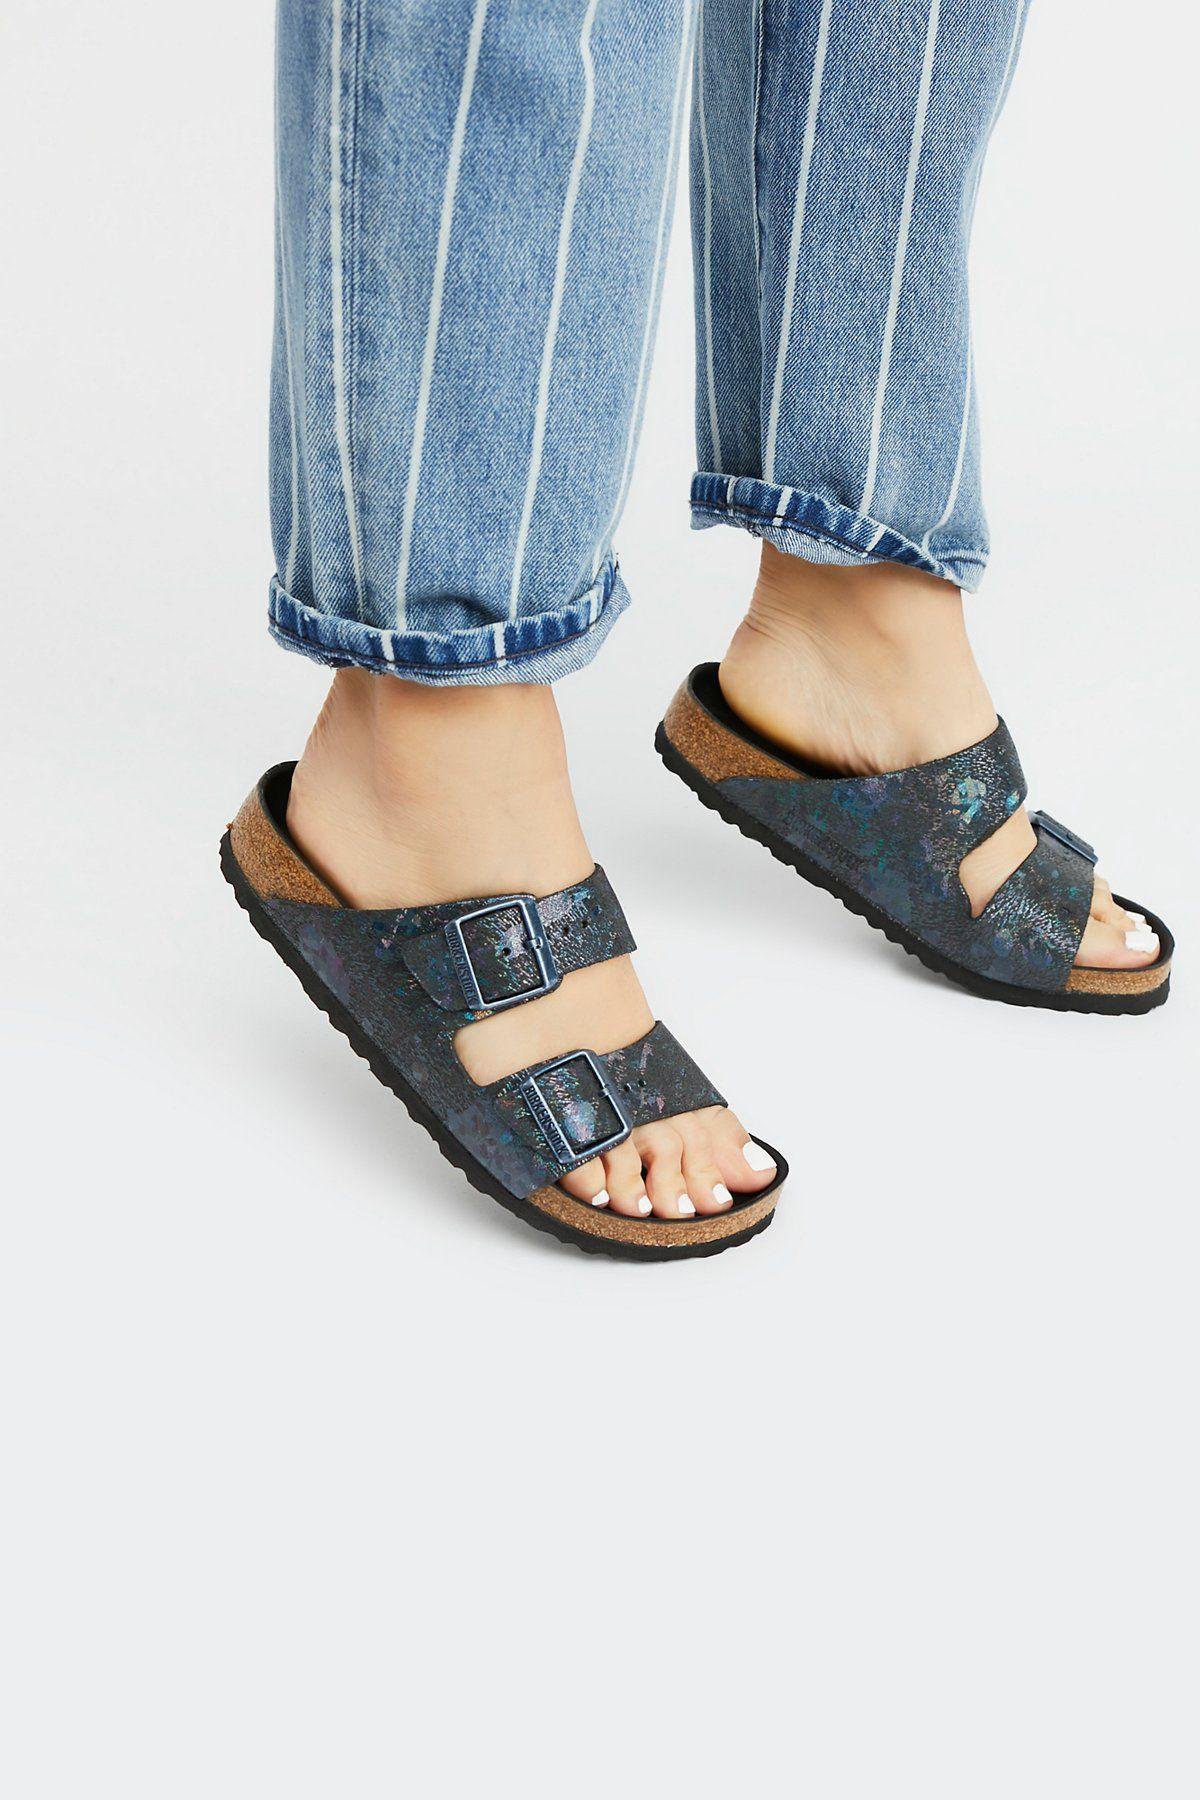 d1c7852bd573 Arizona Lux Metallic Birkenstock Sandal